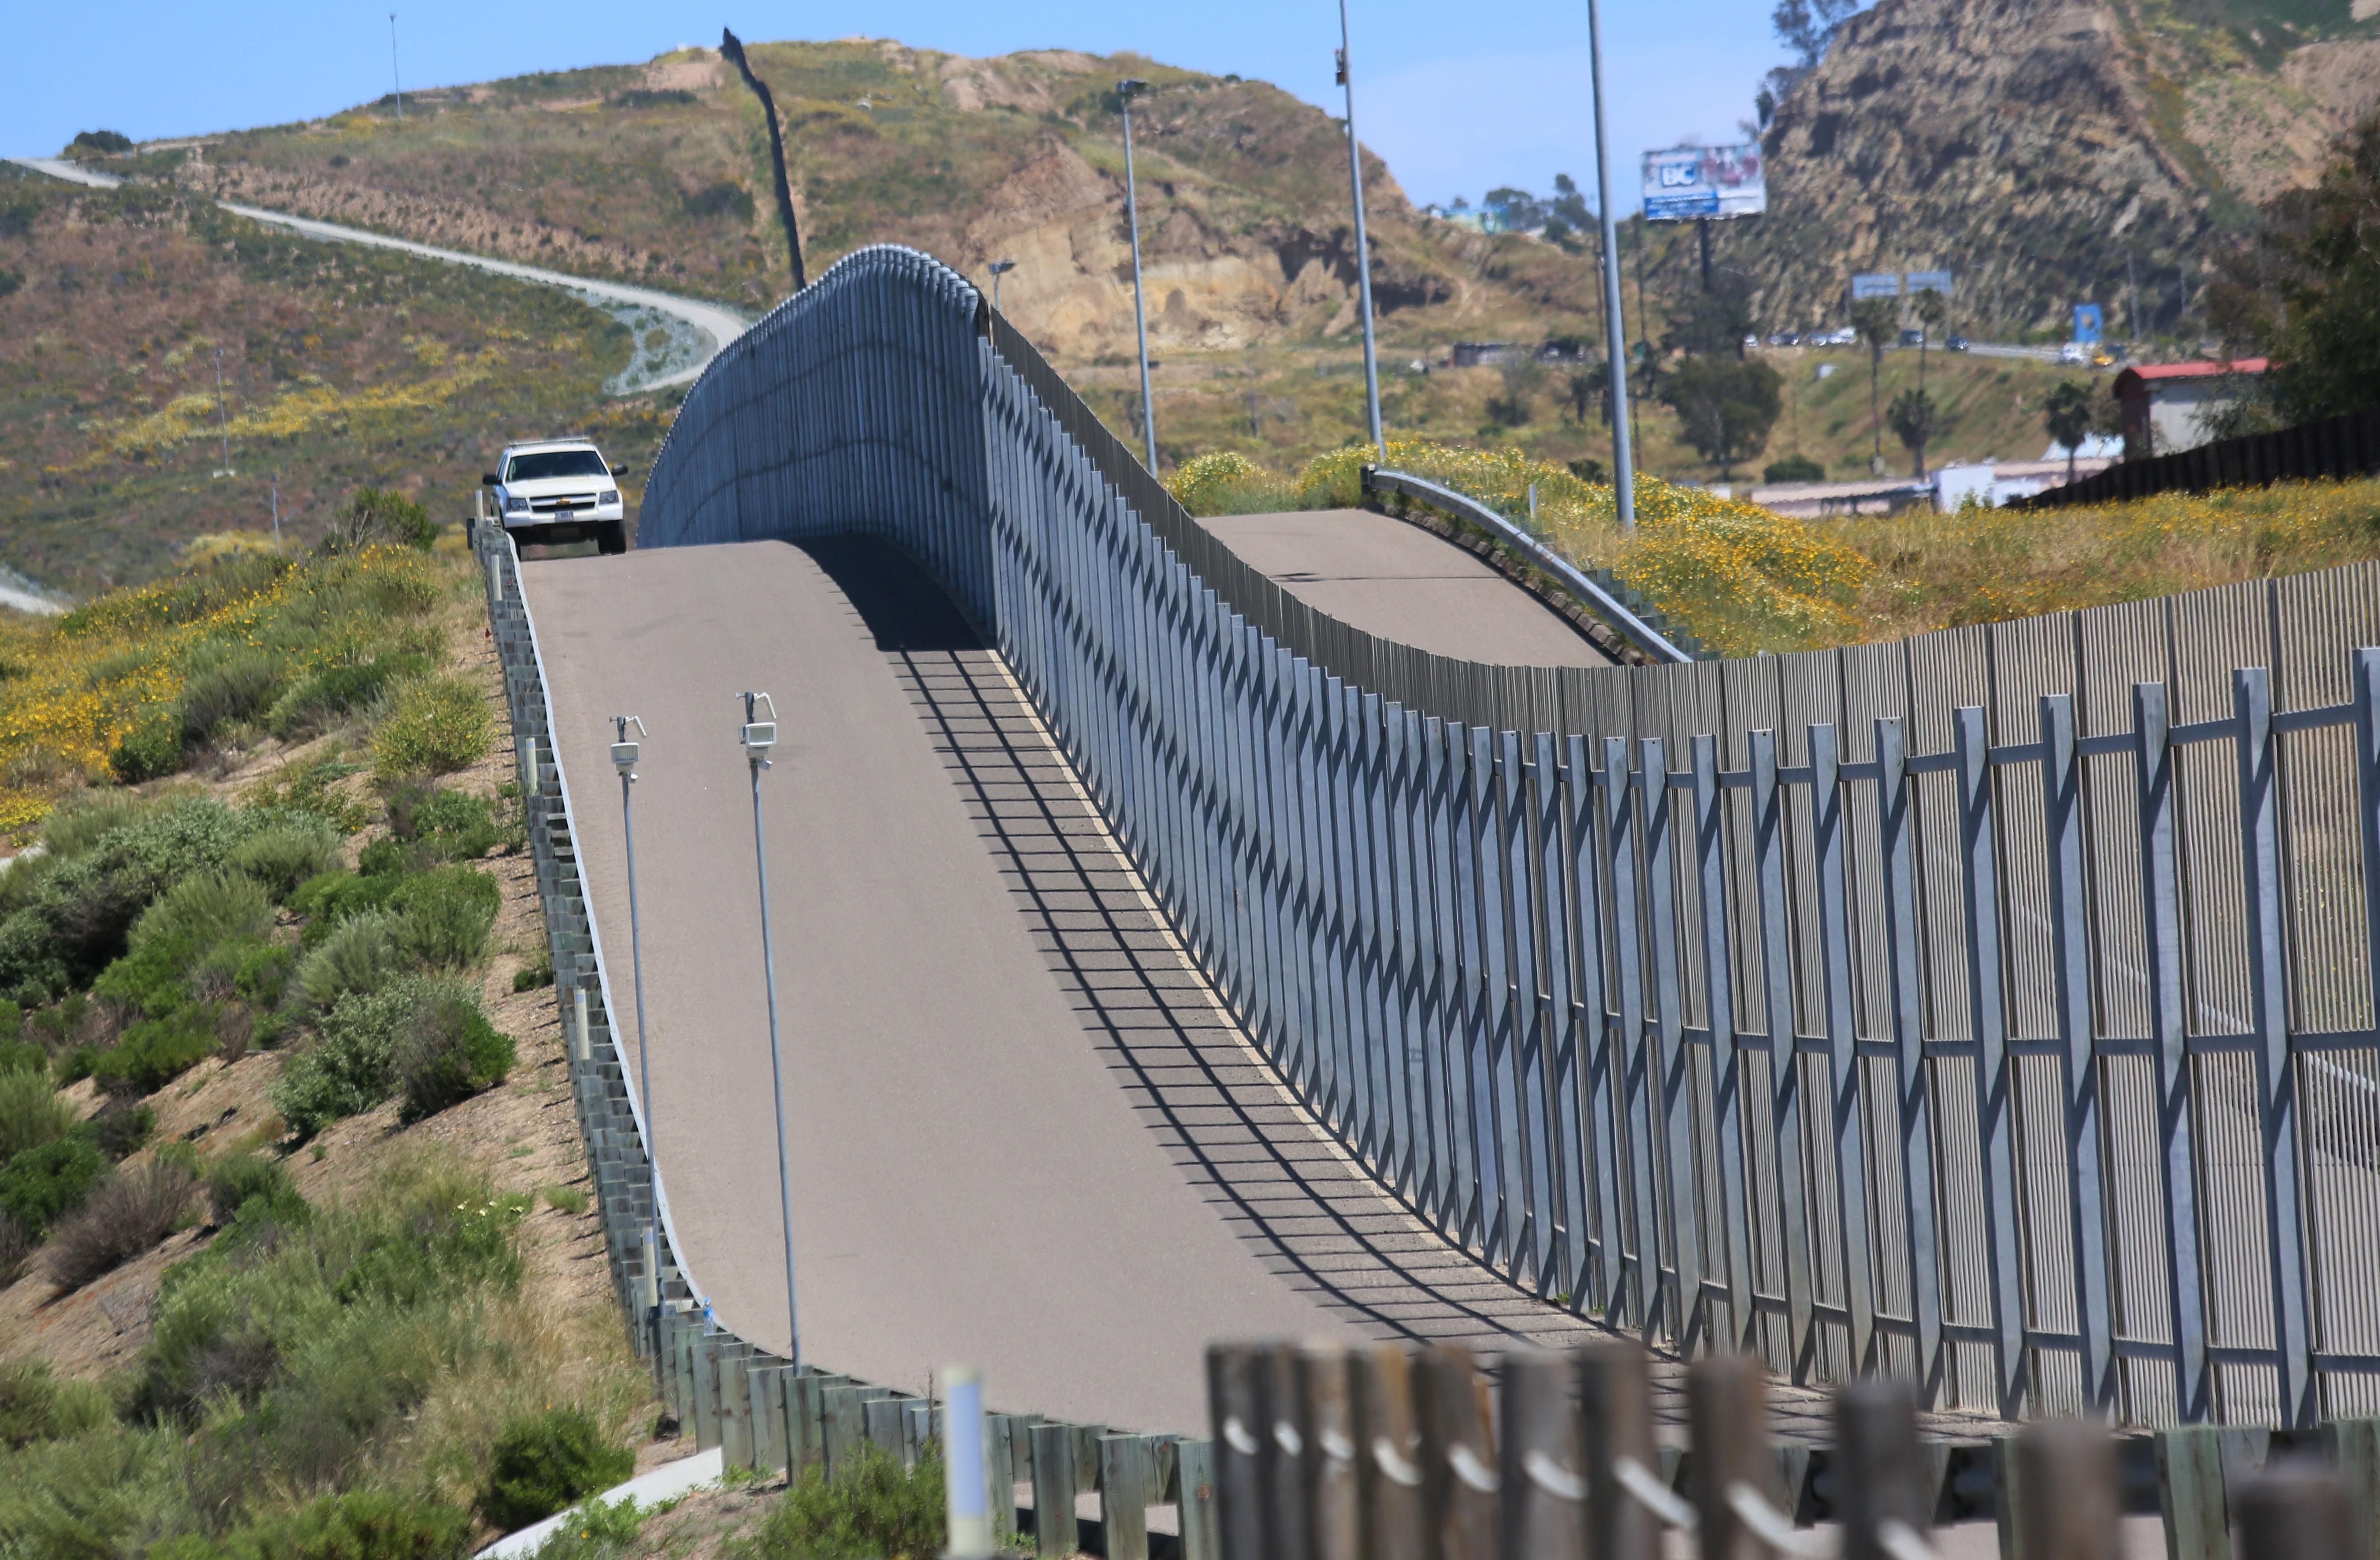 U.S. Border Patrol agents patrol the U.S.-Mexico border at Friendship Park in San Ysidro, Calif., April 16, 2017.